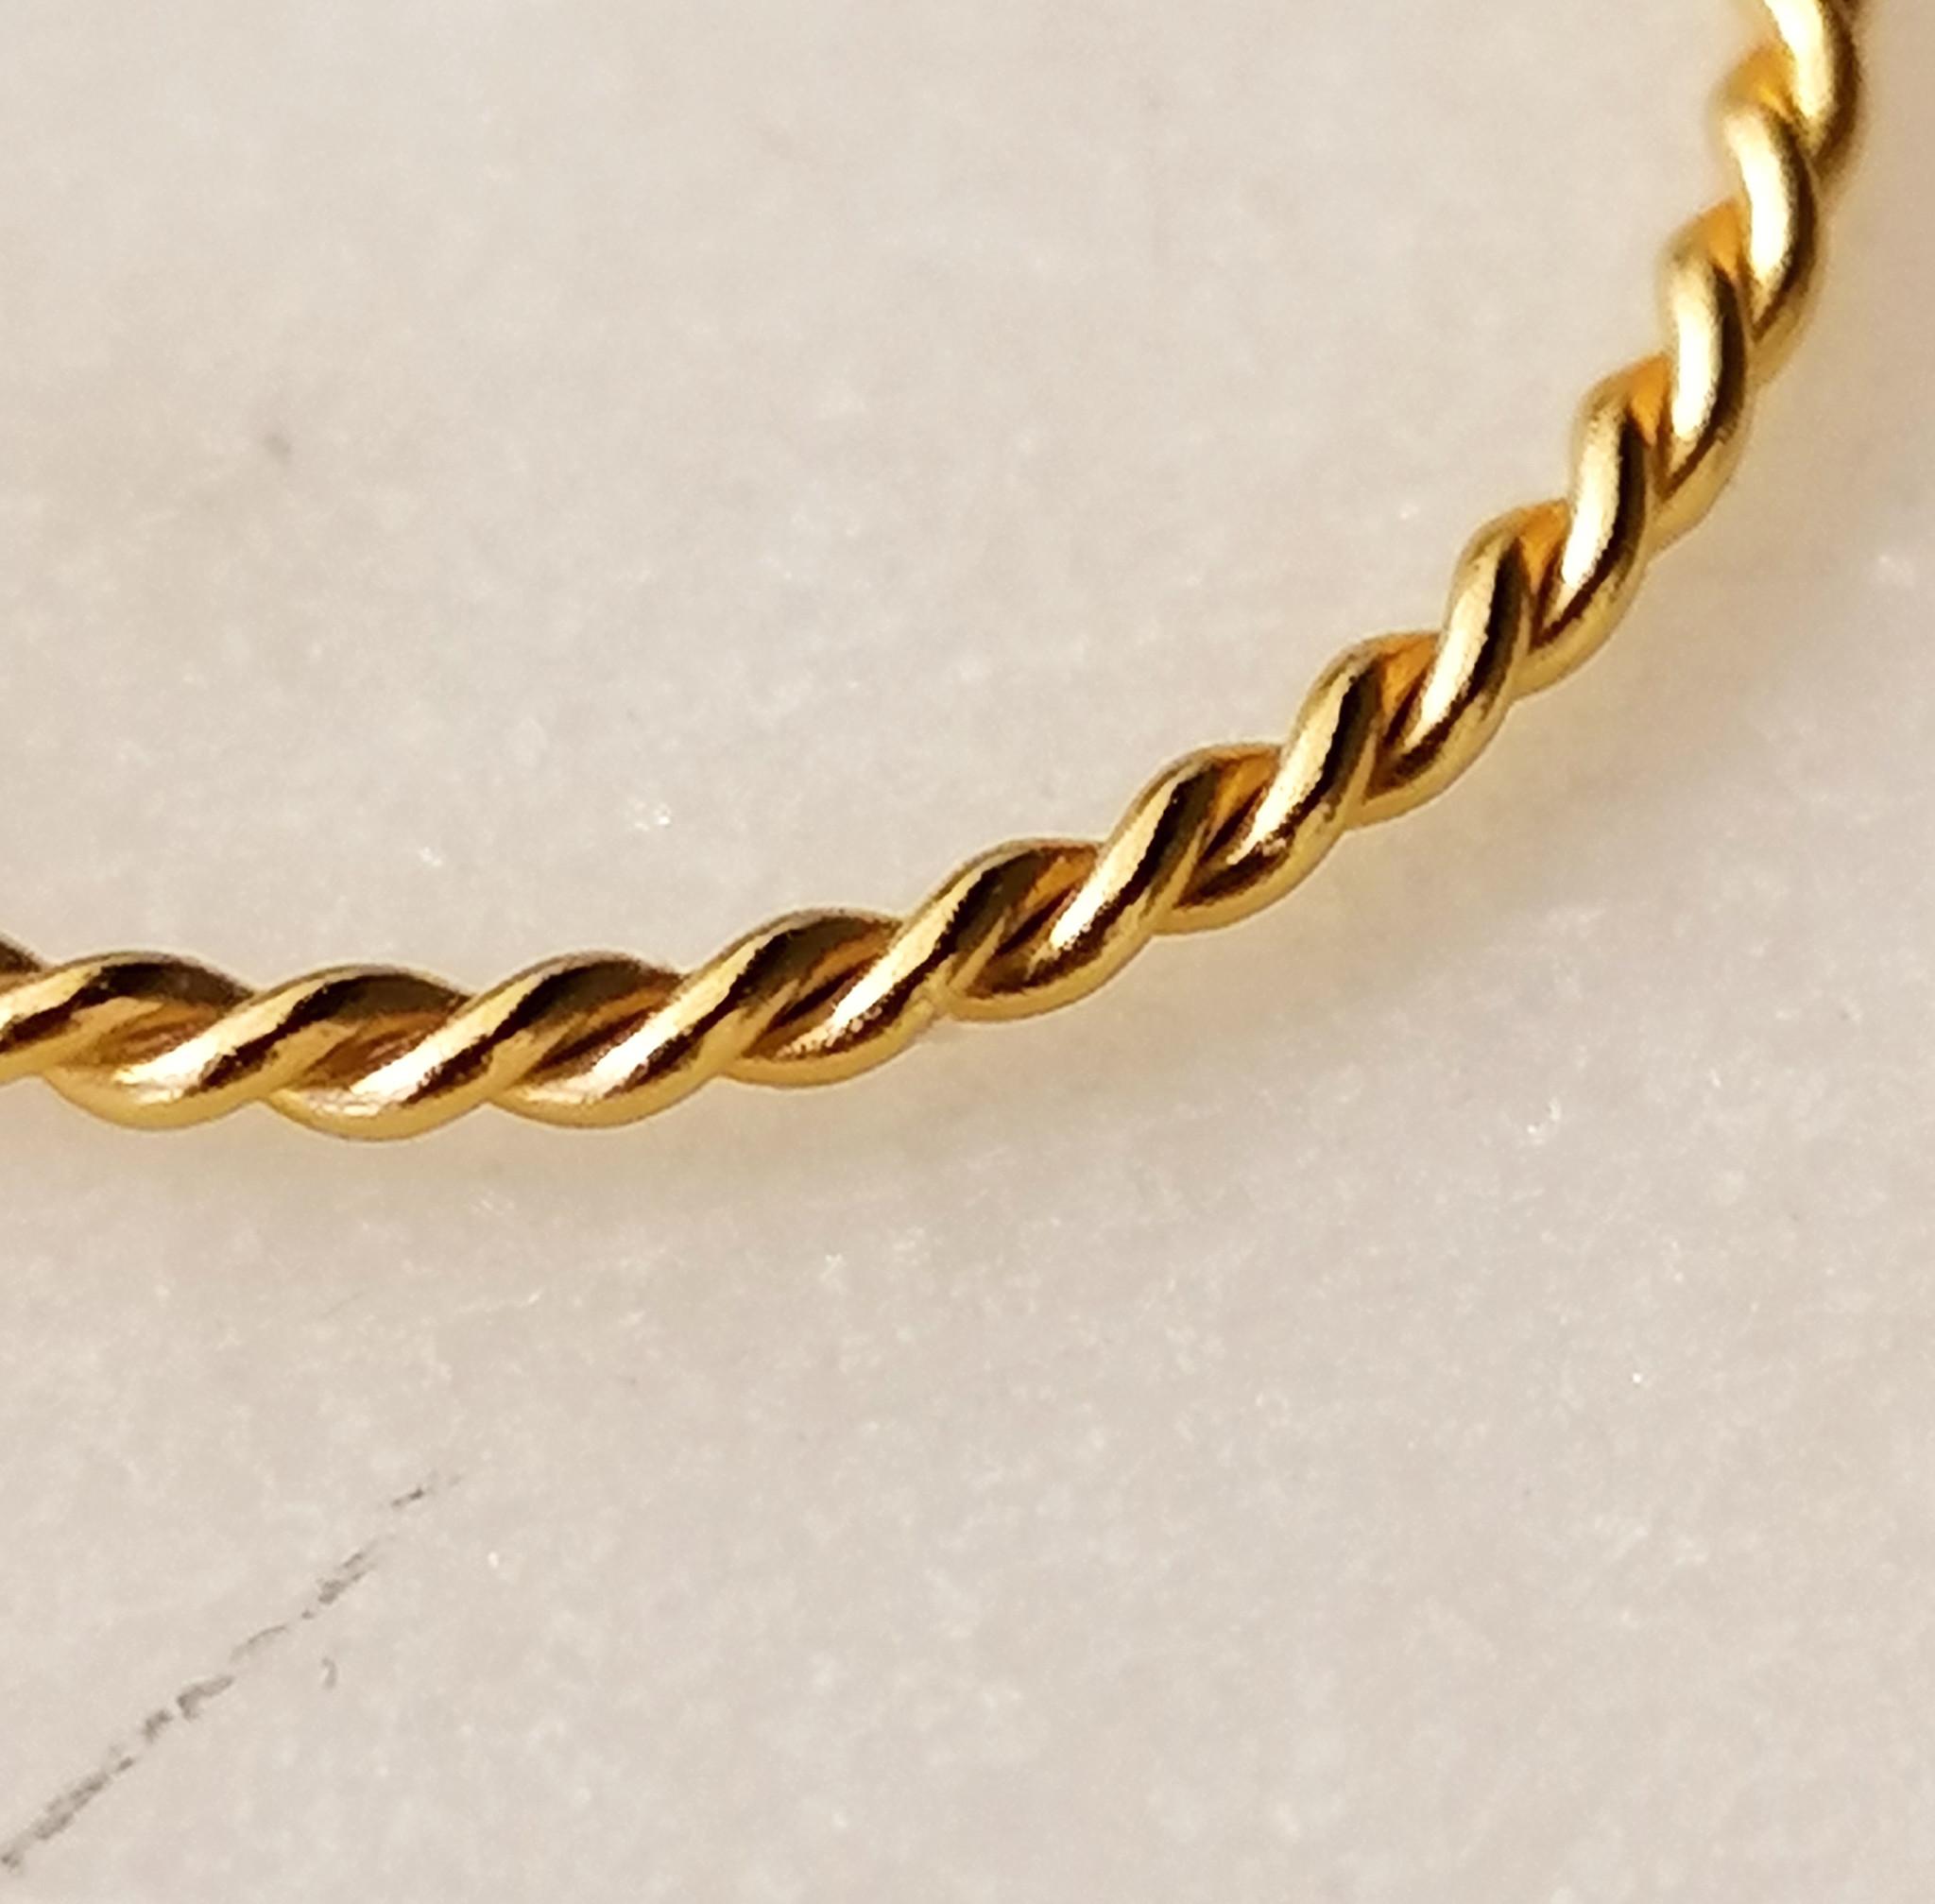 Fein geflochtener Ring aus 925er Sterling Silber - Gold-4